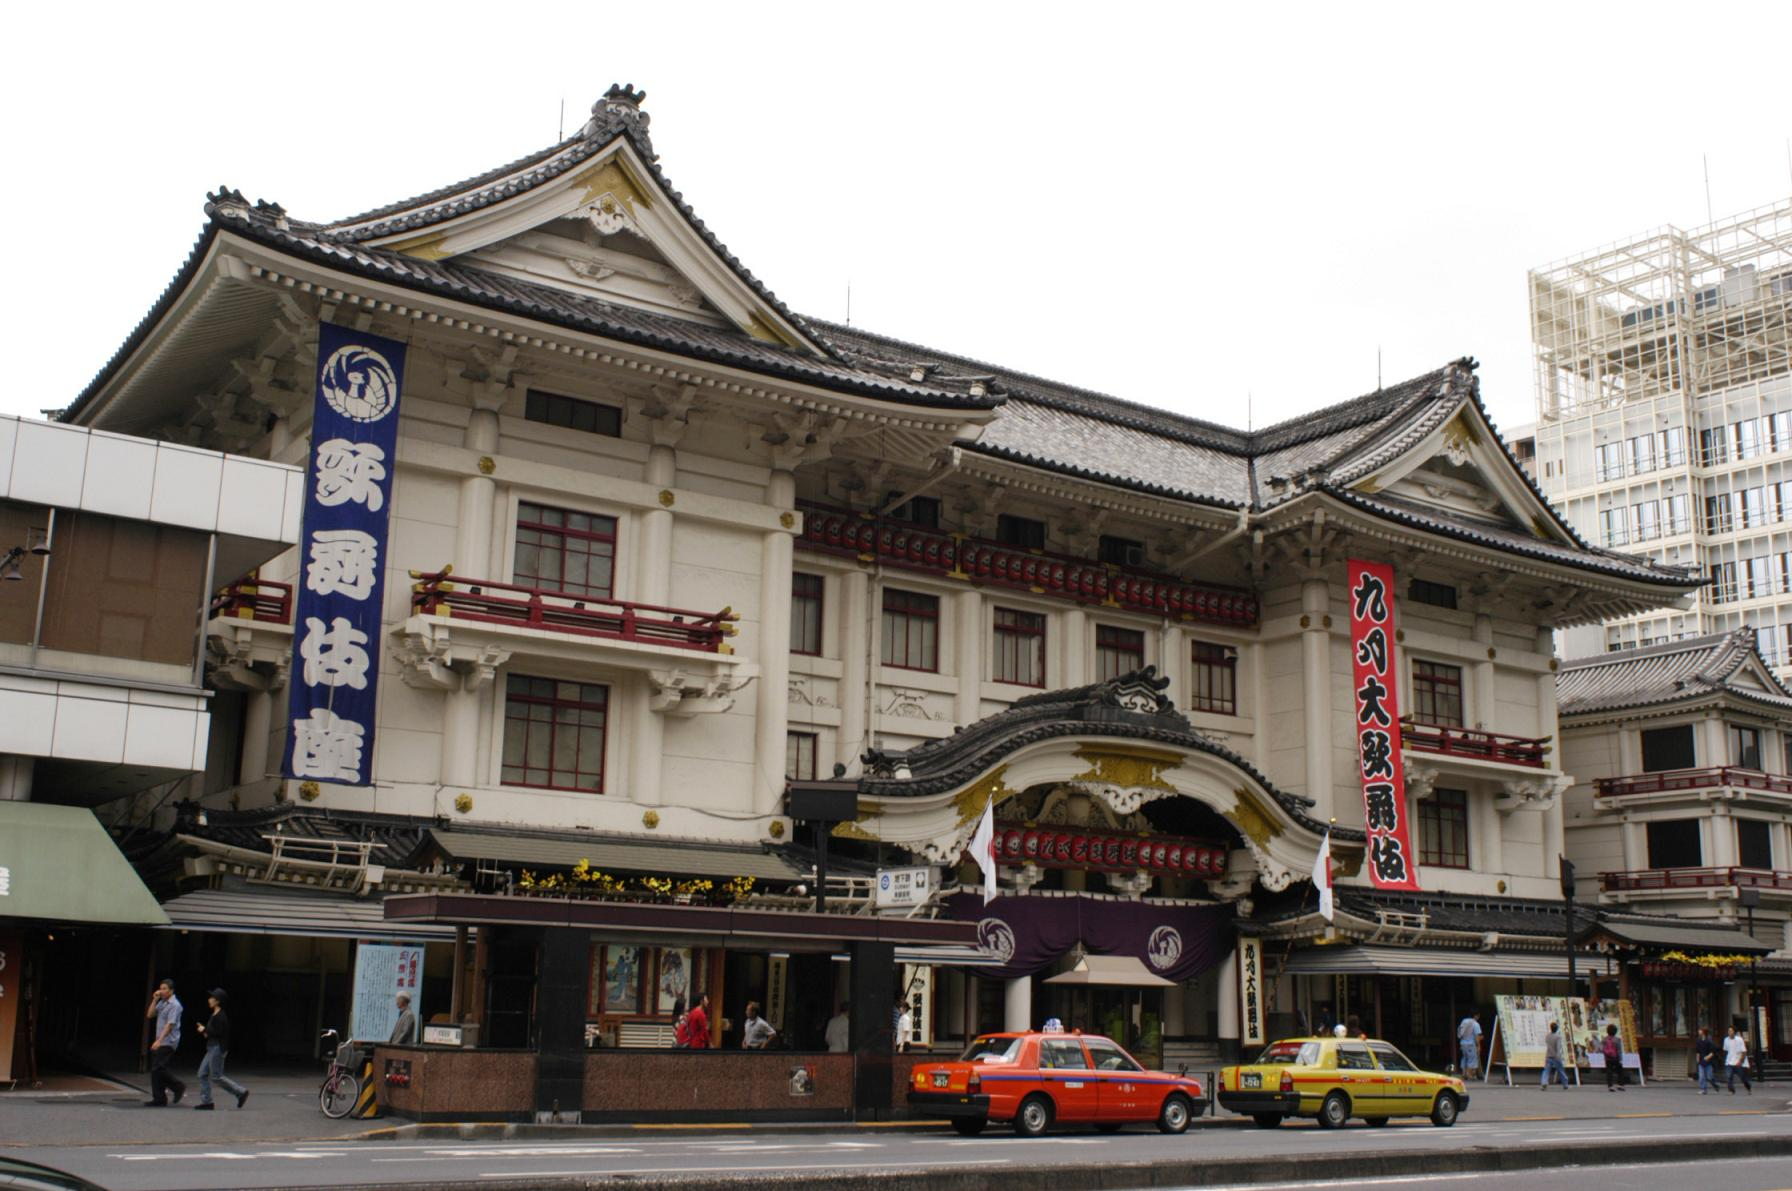 japon banzai (hiroshima y miyajima)